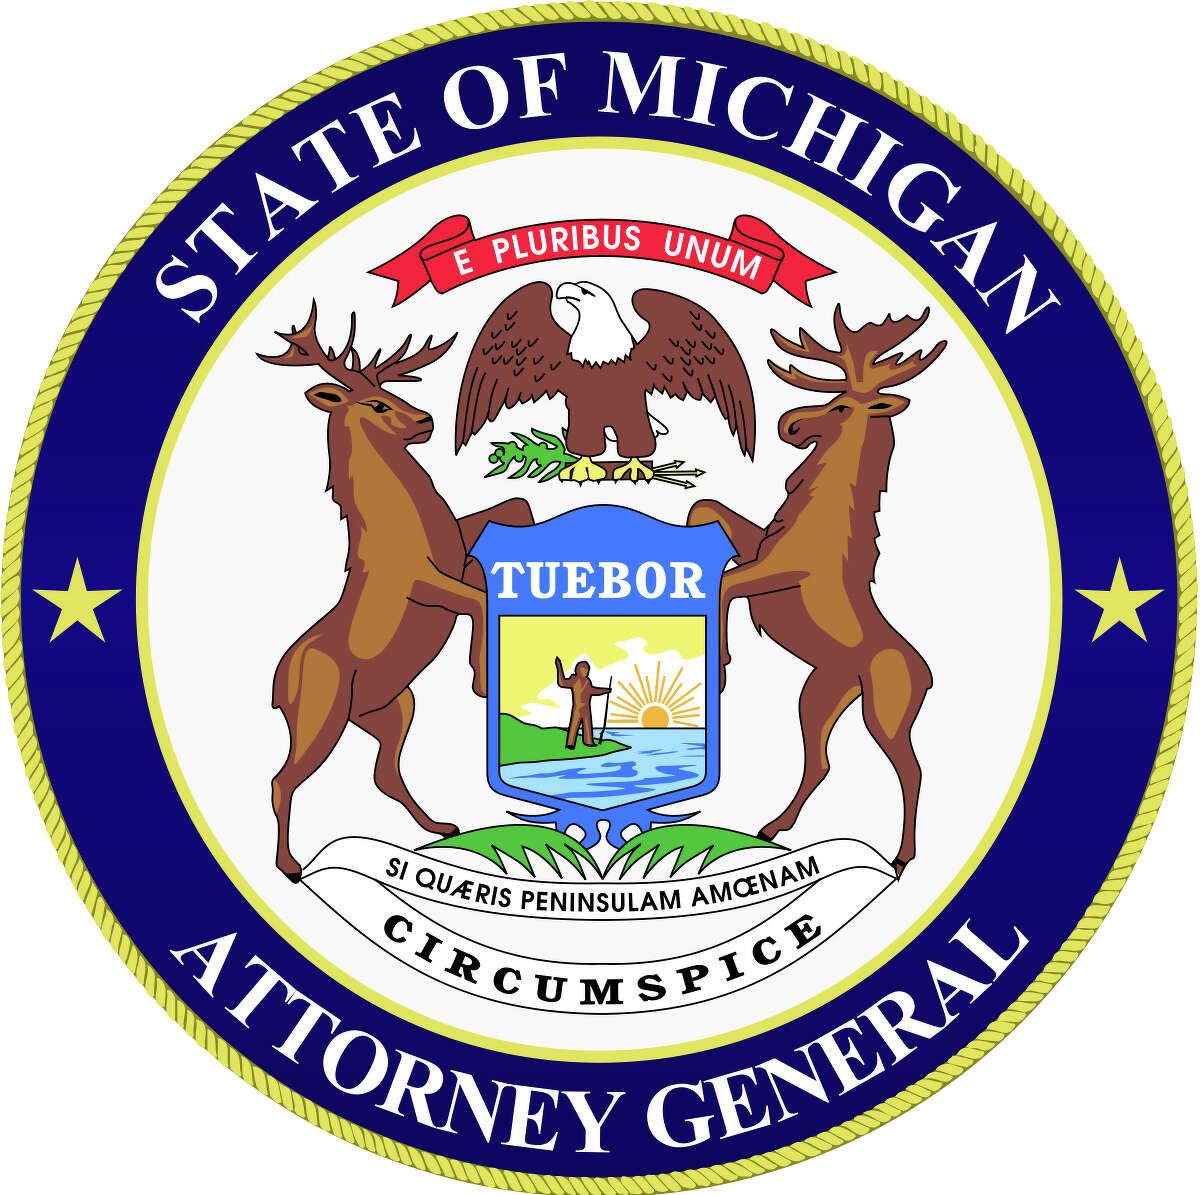 (State of Michigan)